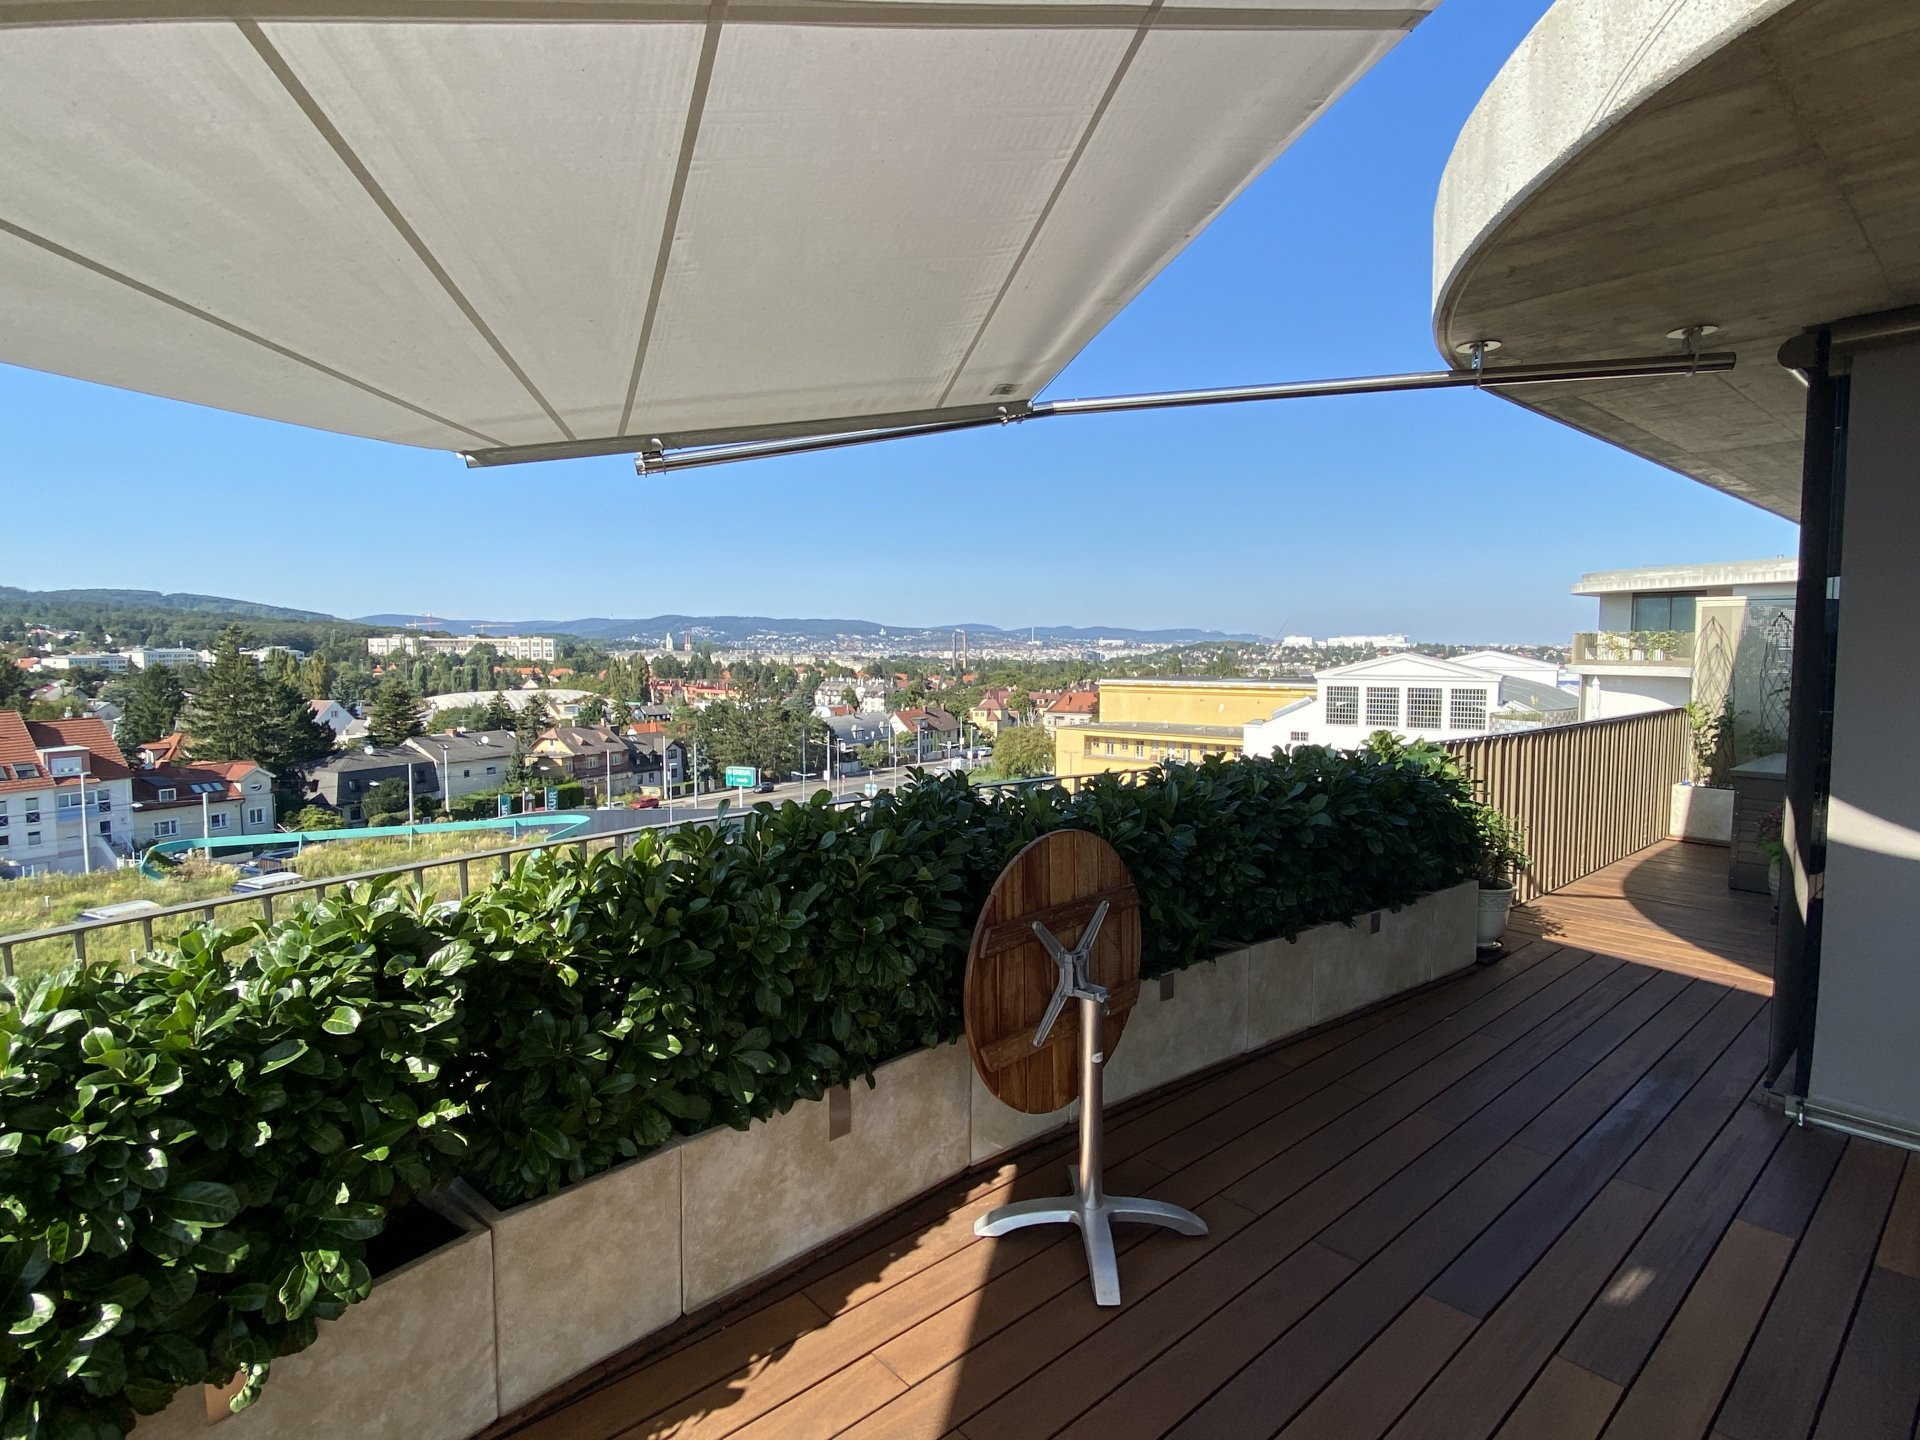 SunSquare: Rechtecksegel-Cantilever